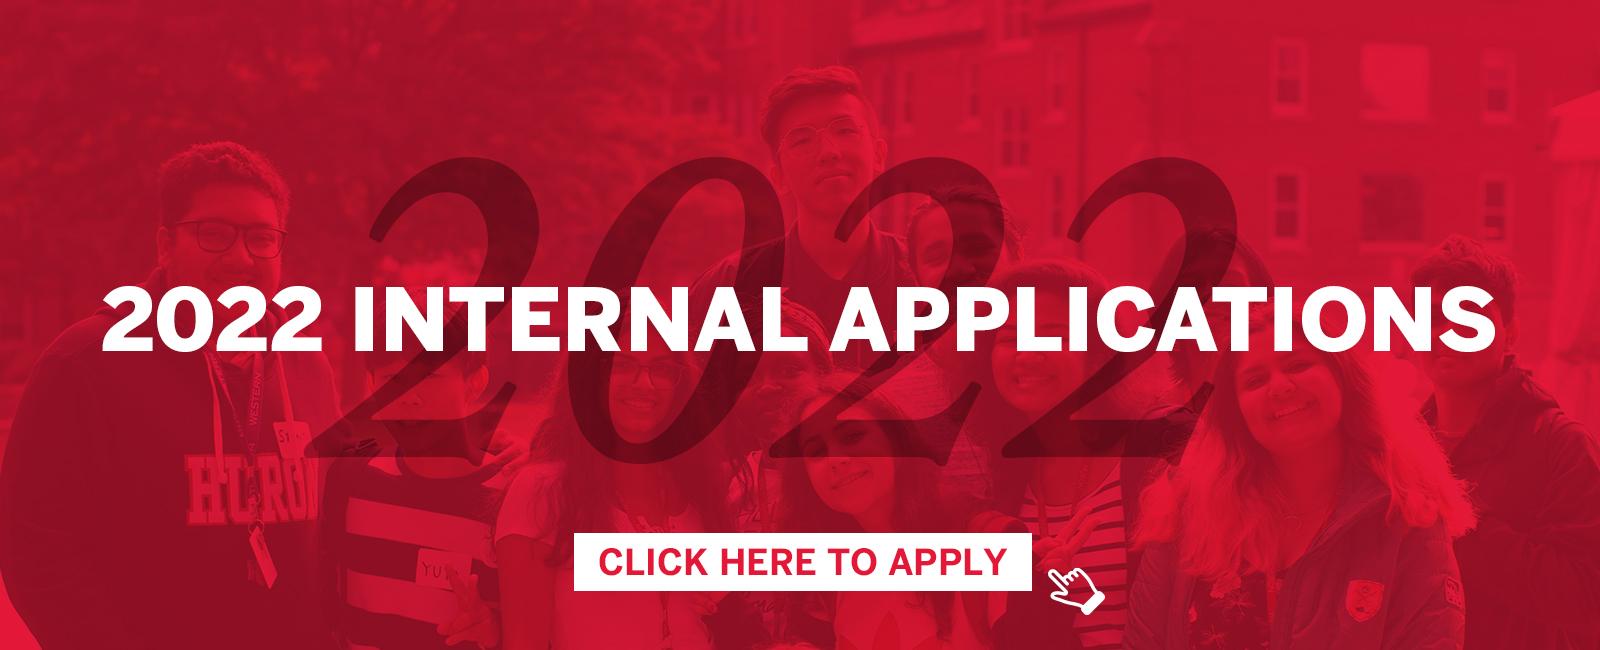 2022 Internal Applications